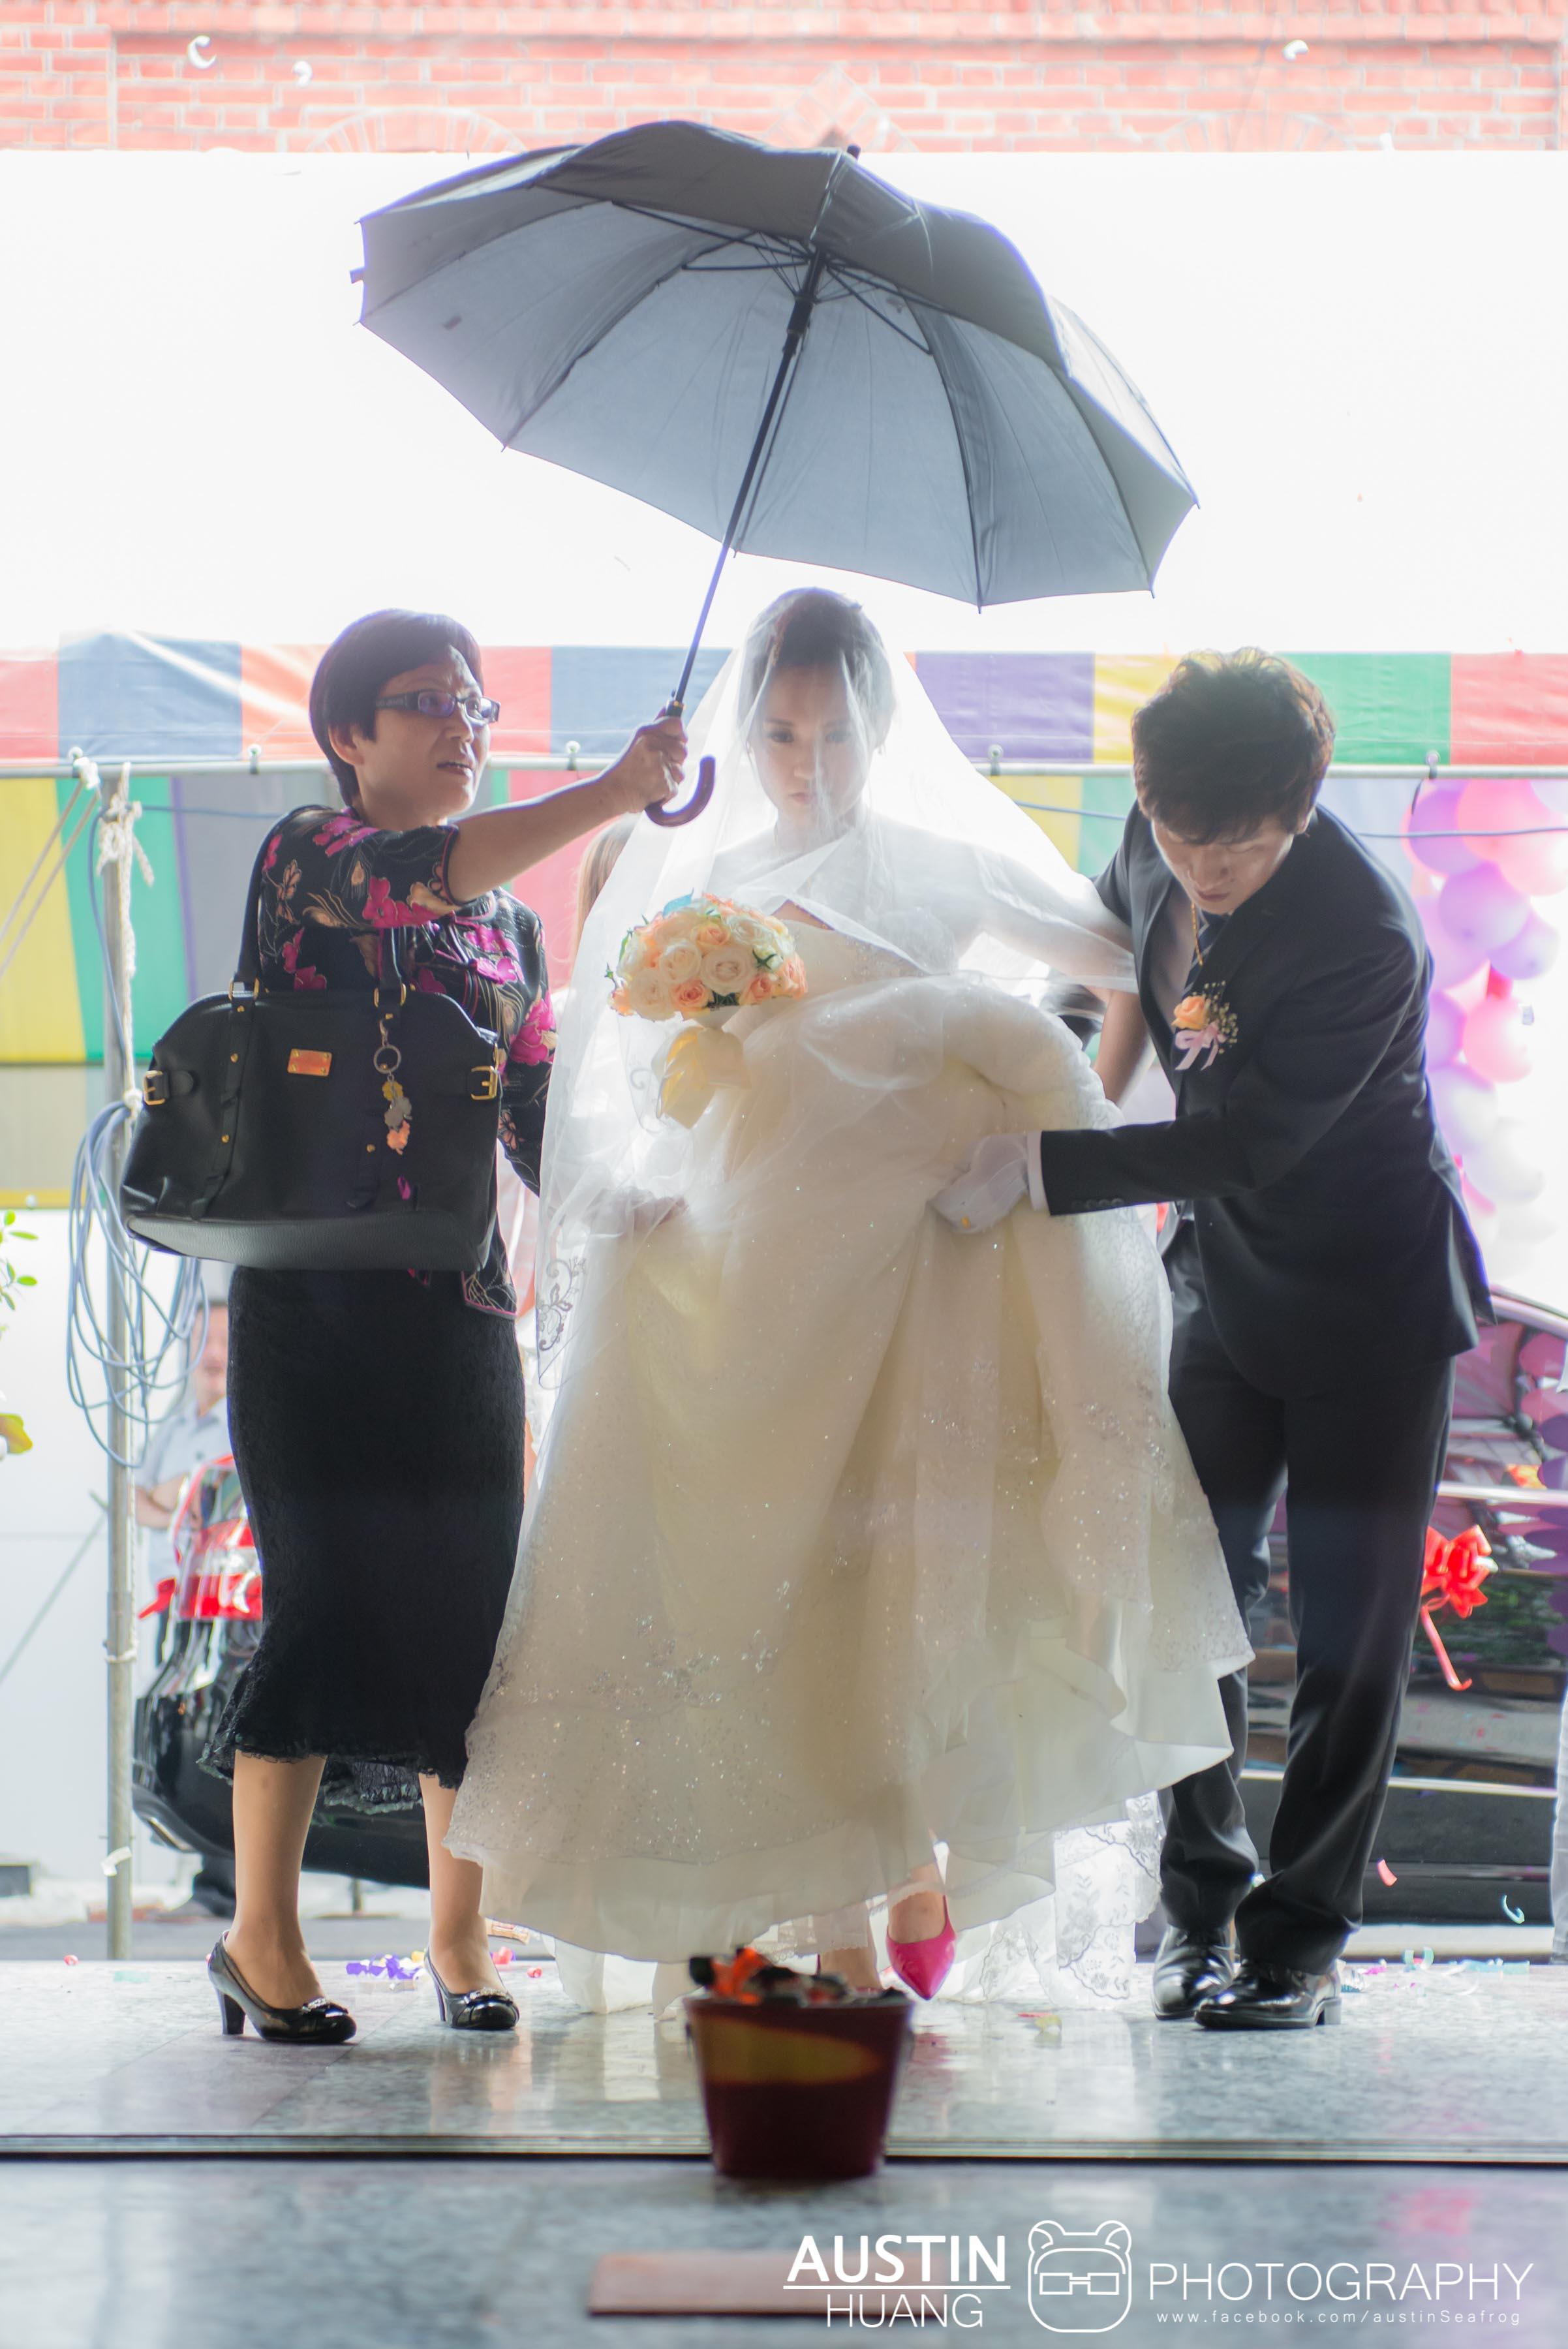 austinseafrog/海蛙攝影/婚攝海蛙婚禮攝影/婚禮紀錄/拍婚禮/婚攝/婚禮錄影/新祕/踩瓦片/過火爐